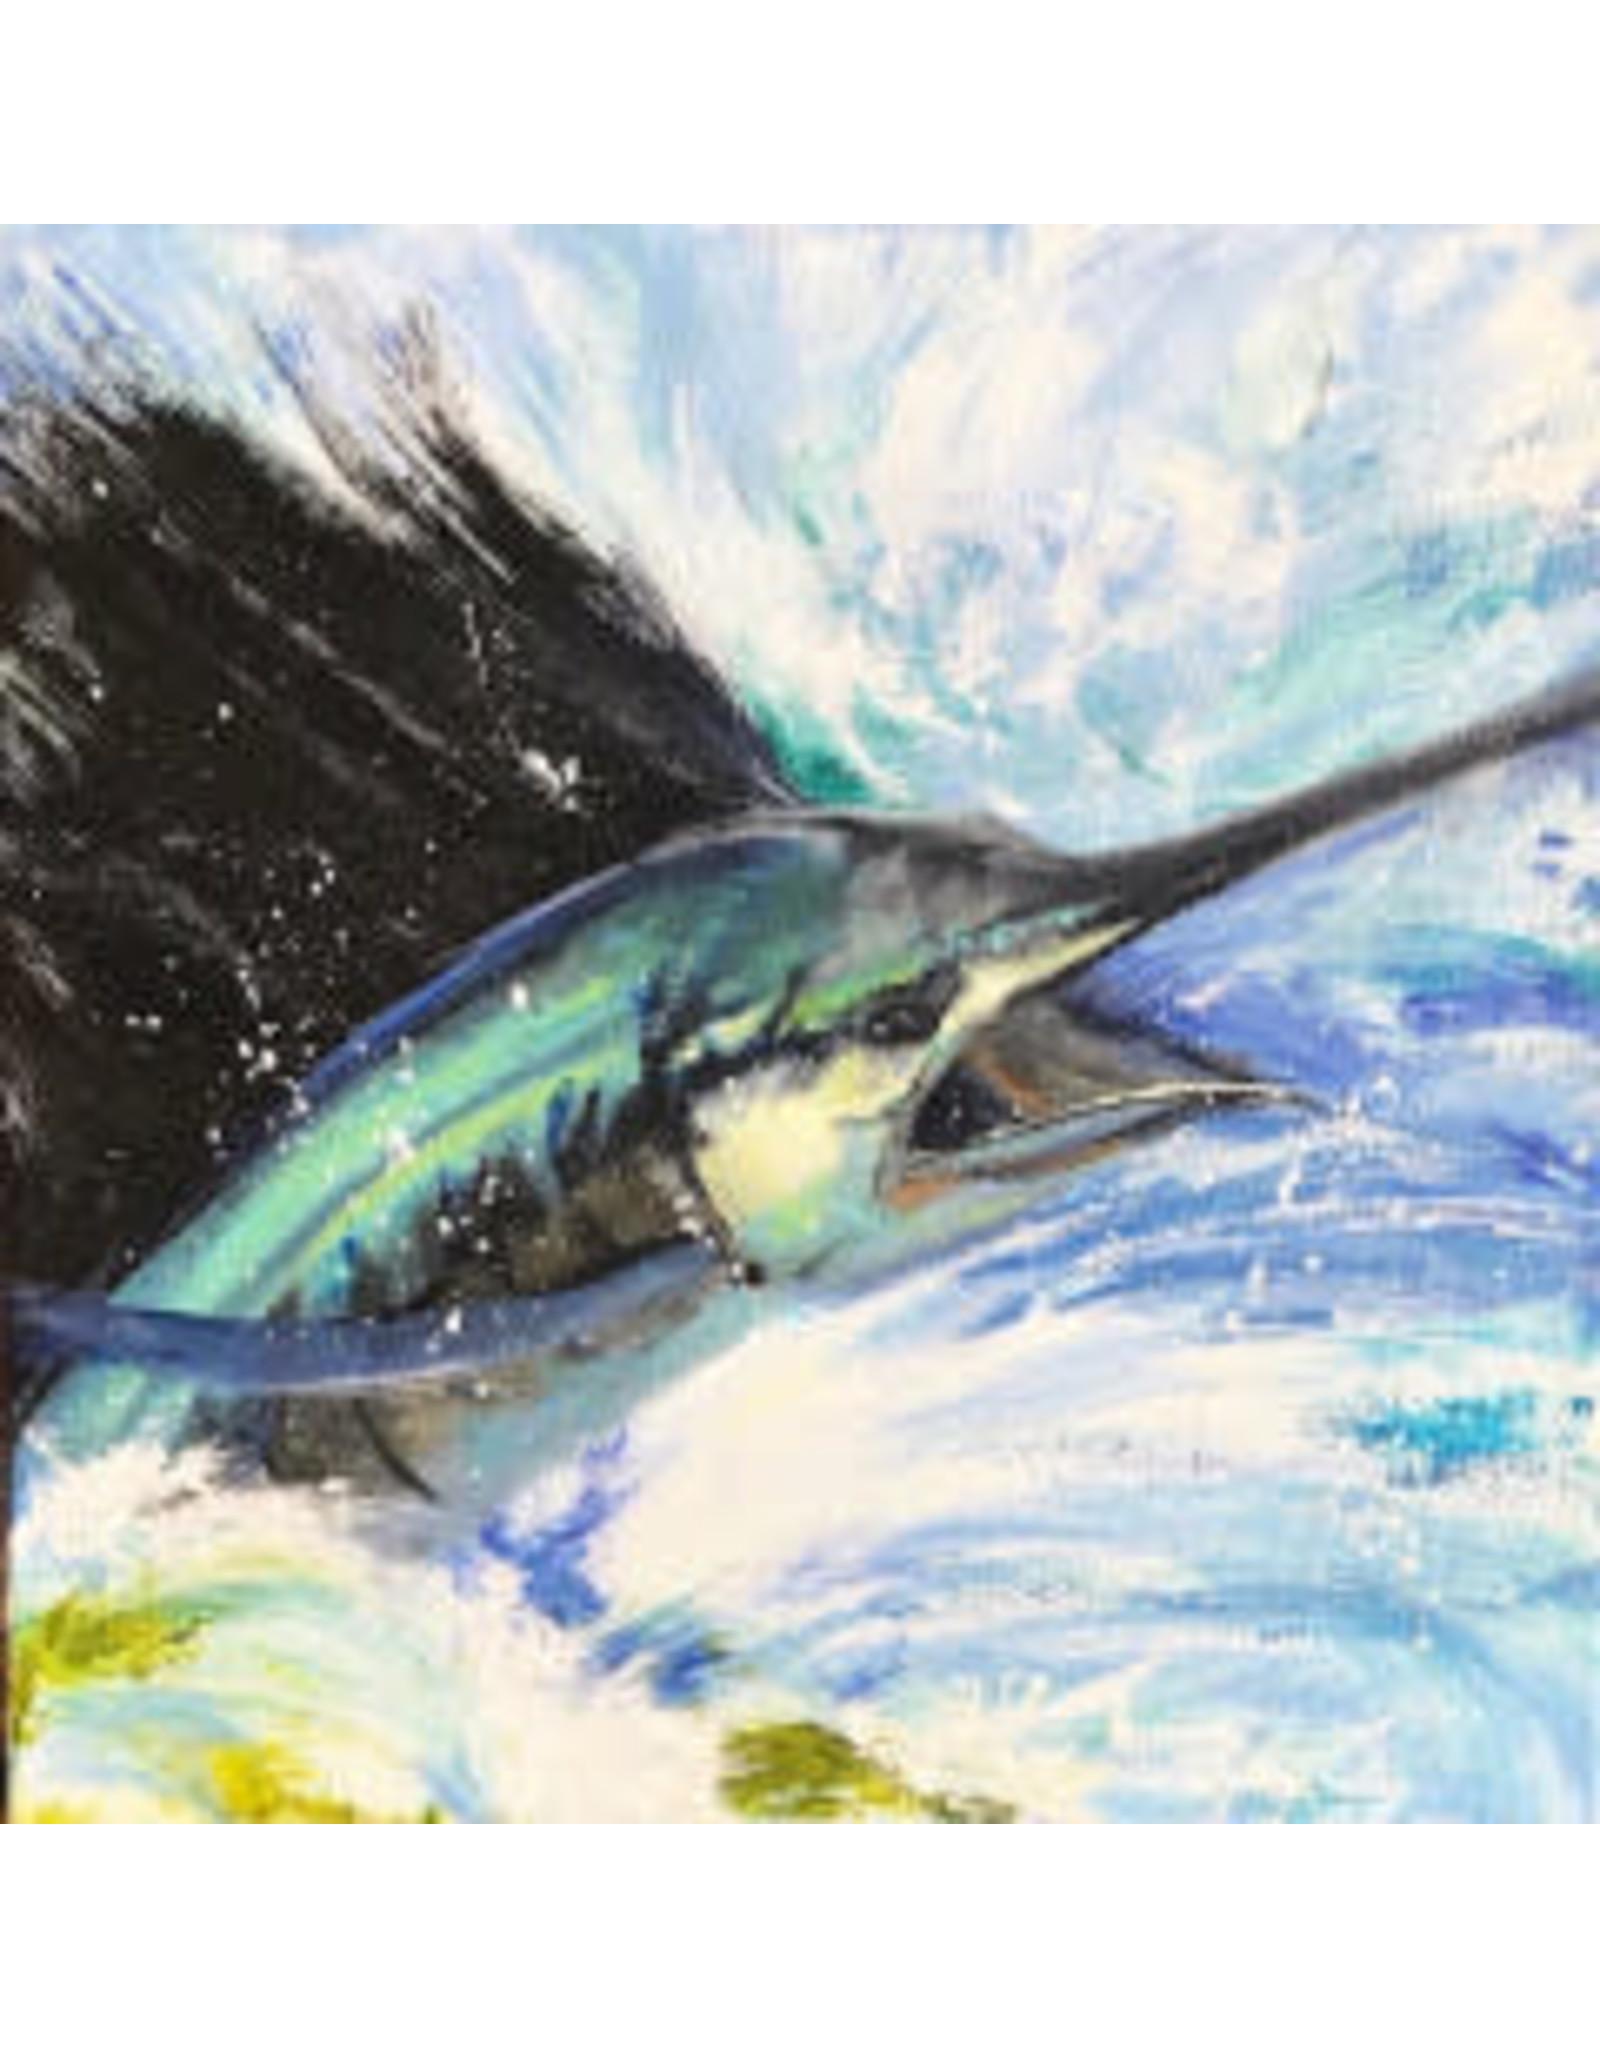 "Michaelann Bellerjeau Sailfish 1 giclee print on paper, 9x9"" MICB)"